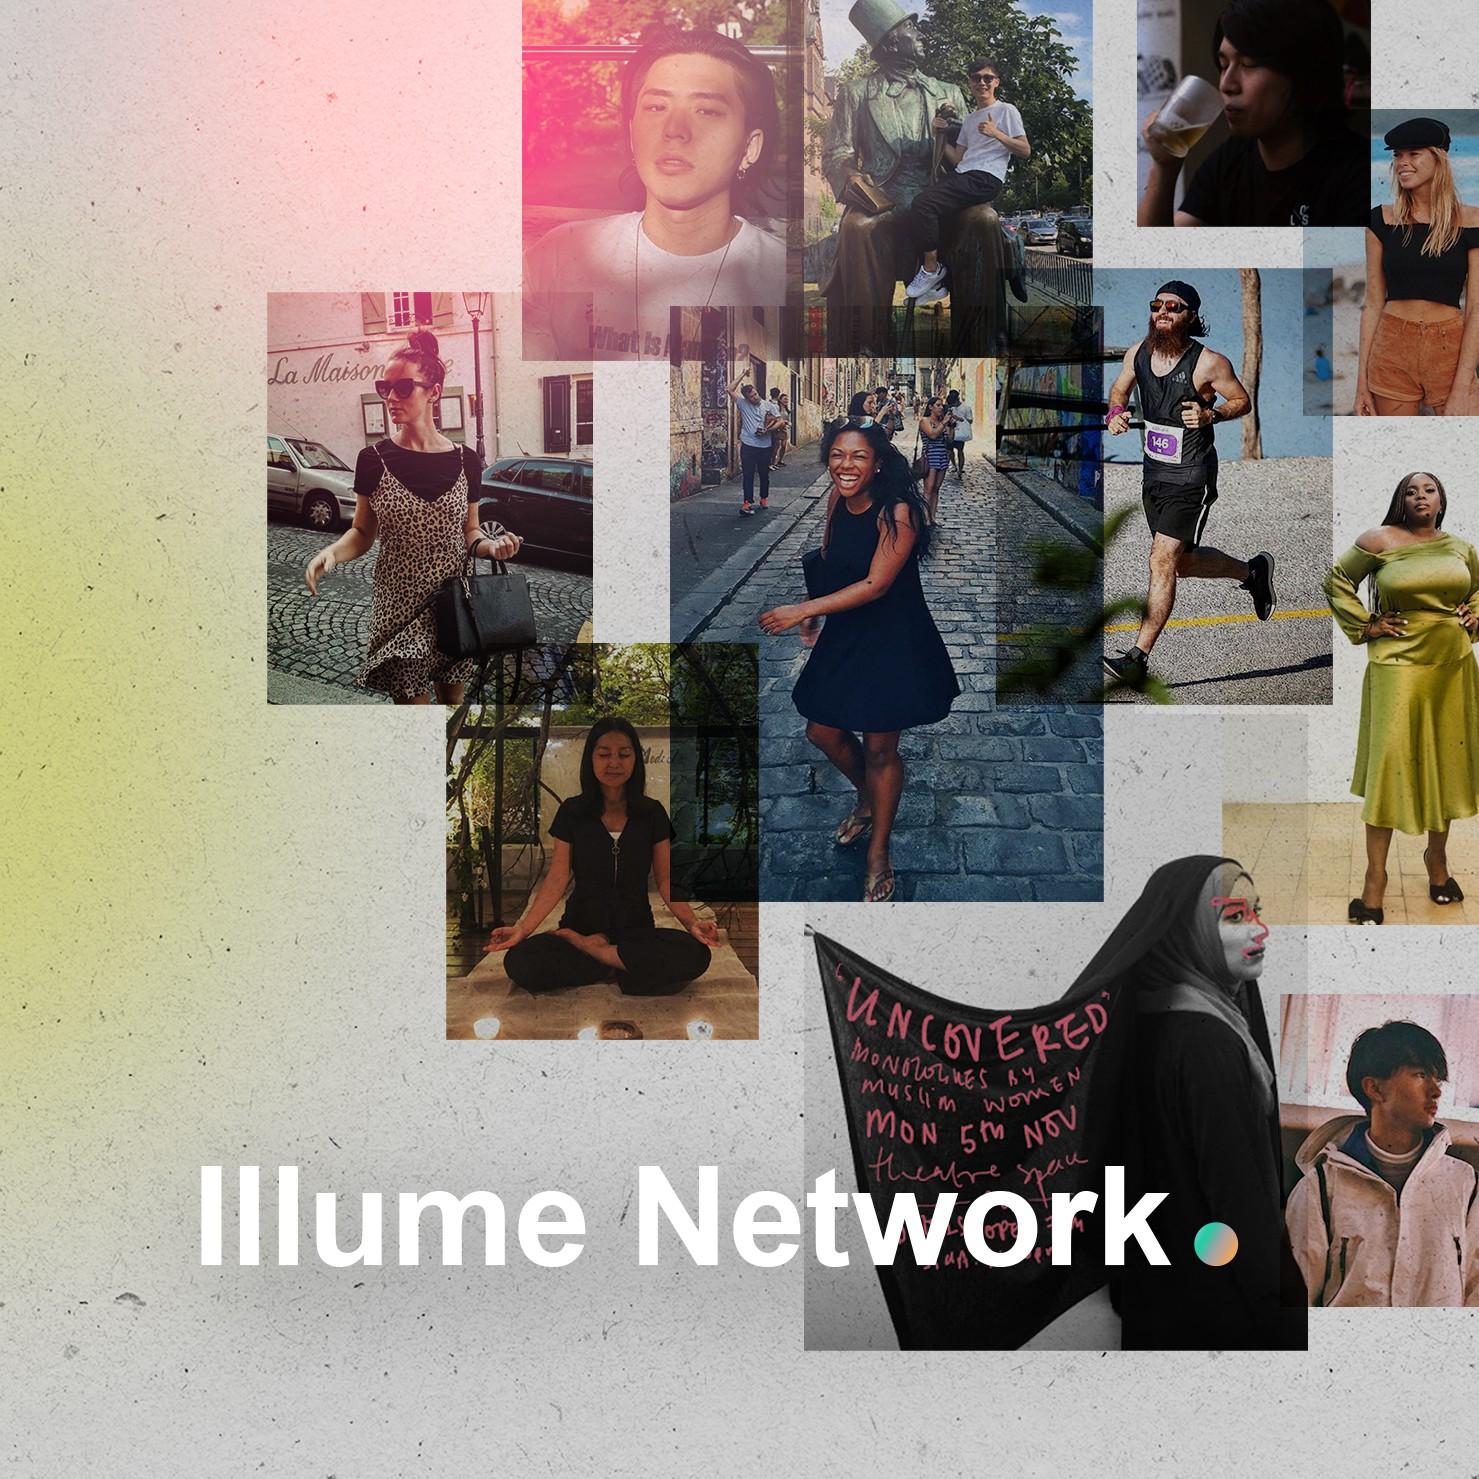 Culture + Trends Illume Network